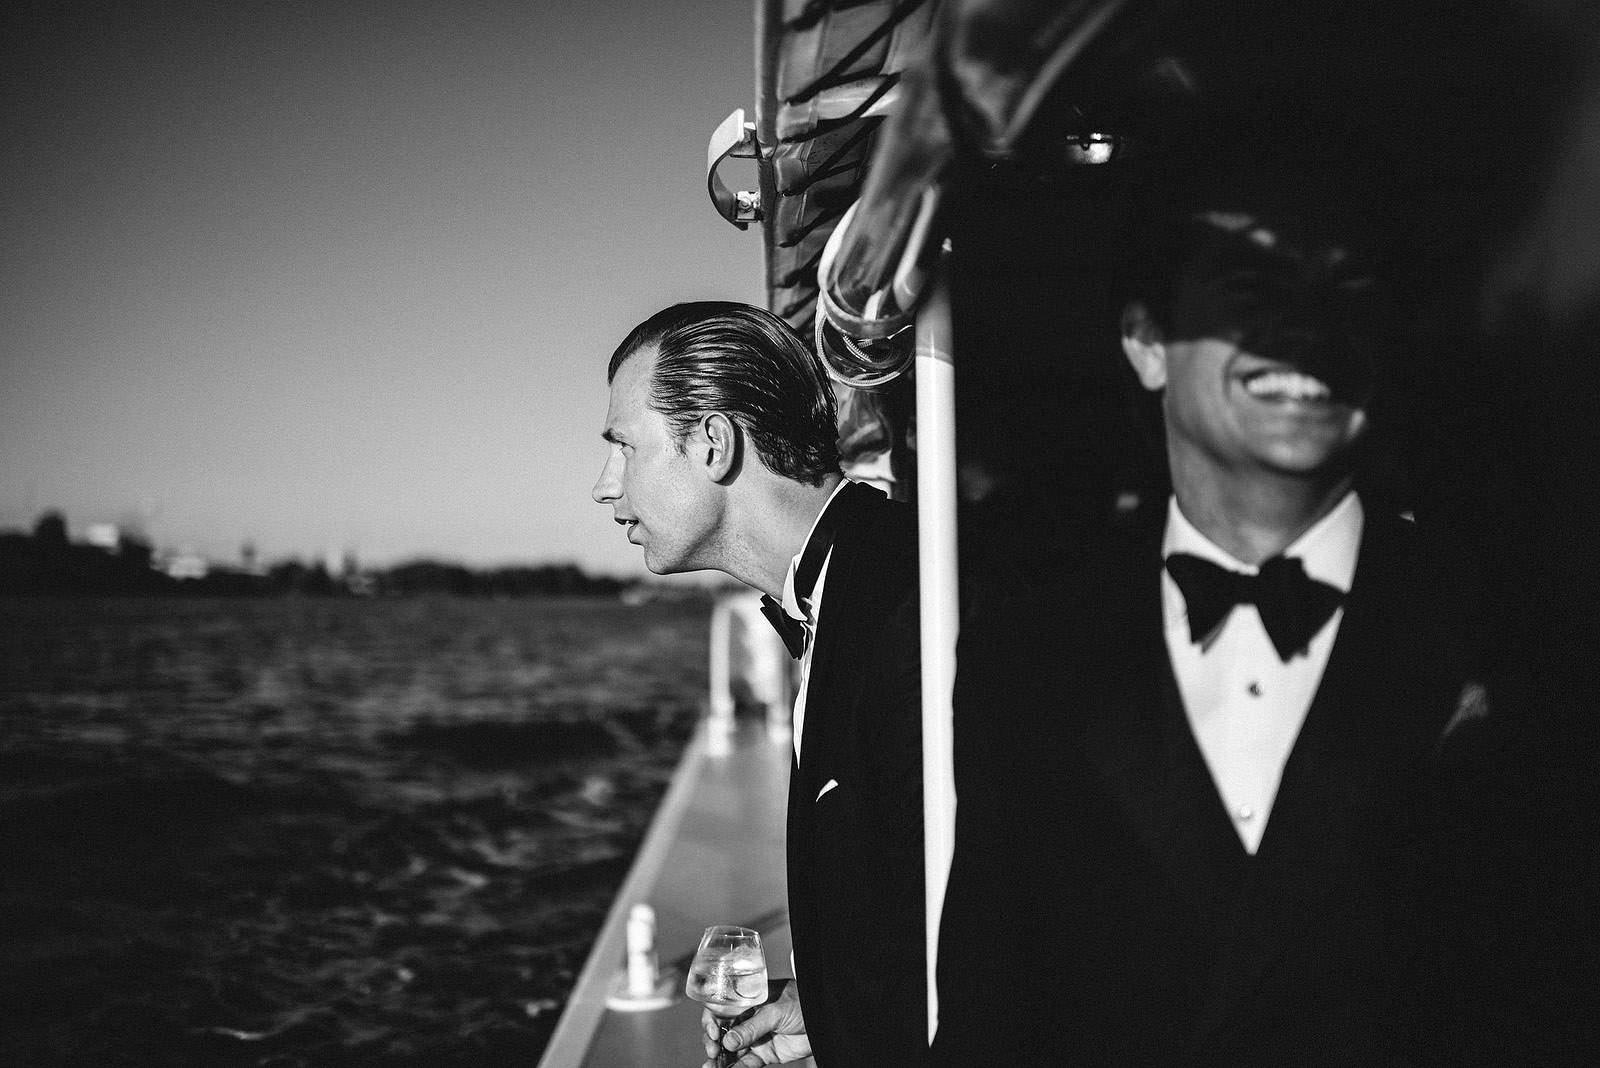 Fotograf Konstanz - Destination Wedding Photographer Amsterdam 103 - Destination Wedding Amsterdam  - 208 -